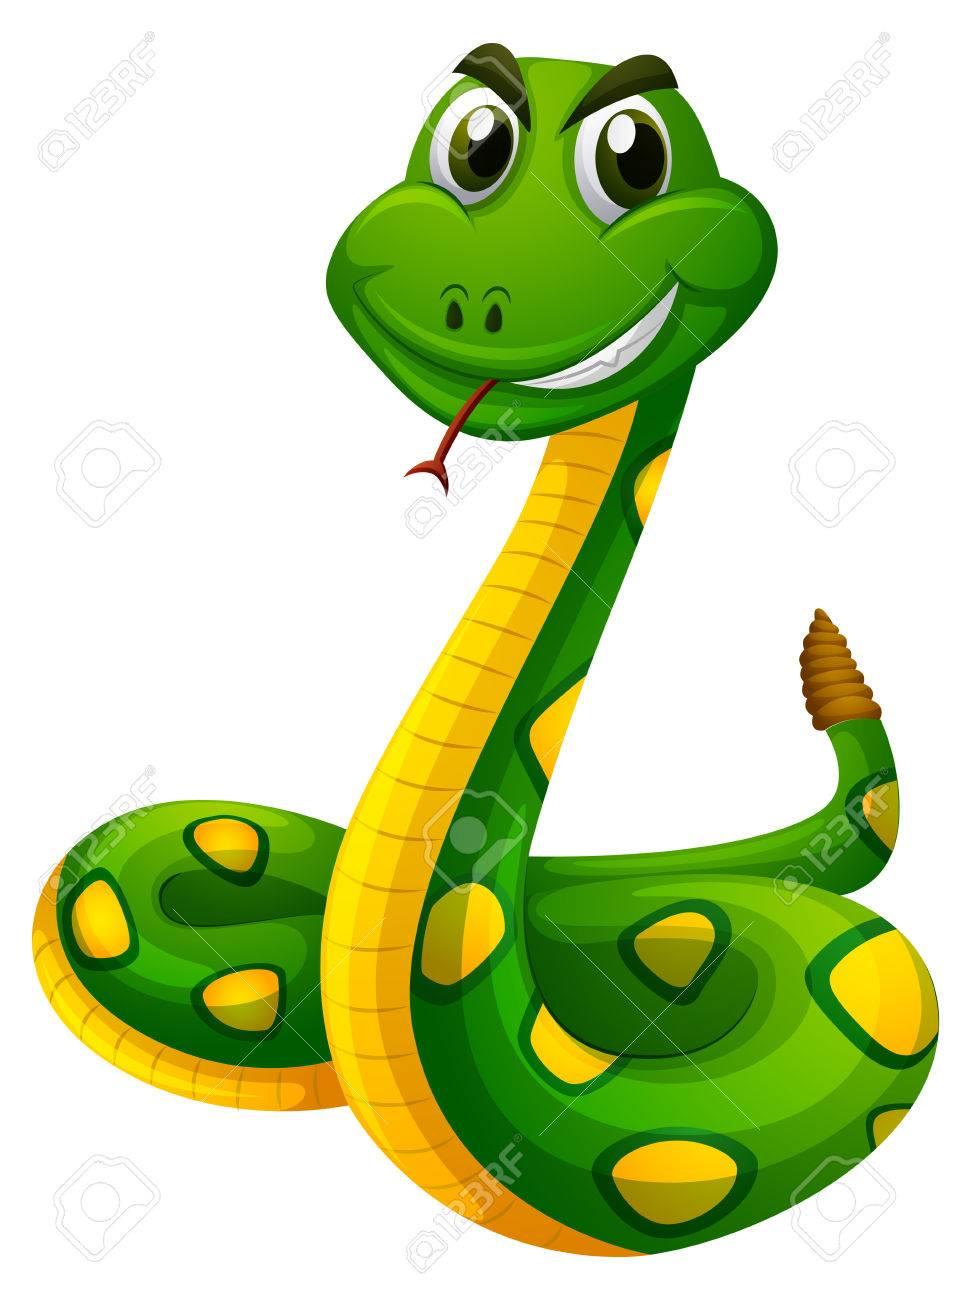 971x1300 Rattle Snake On White Background Illustration Royalty Free